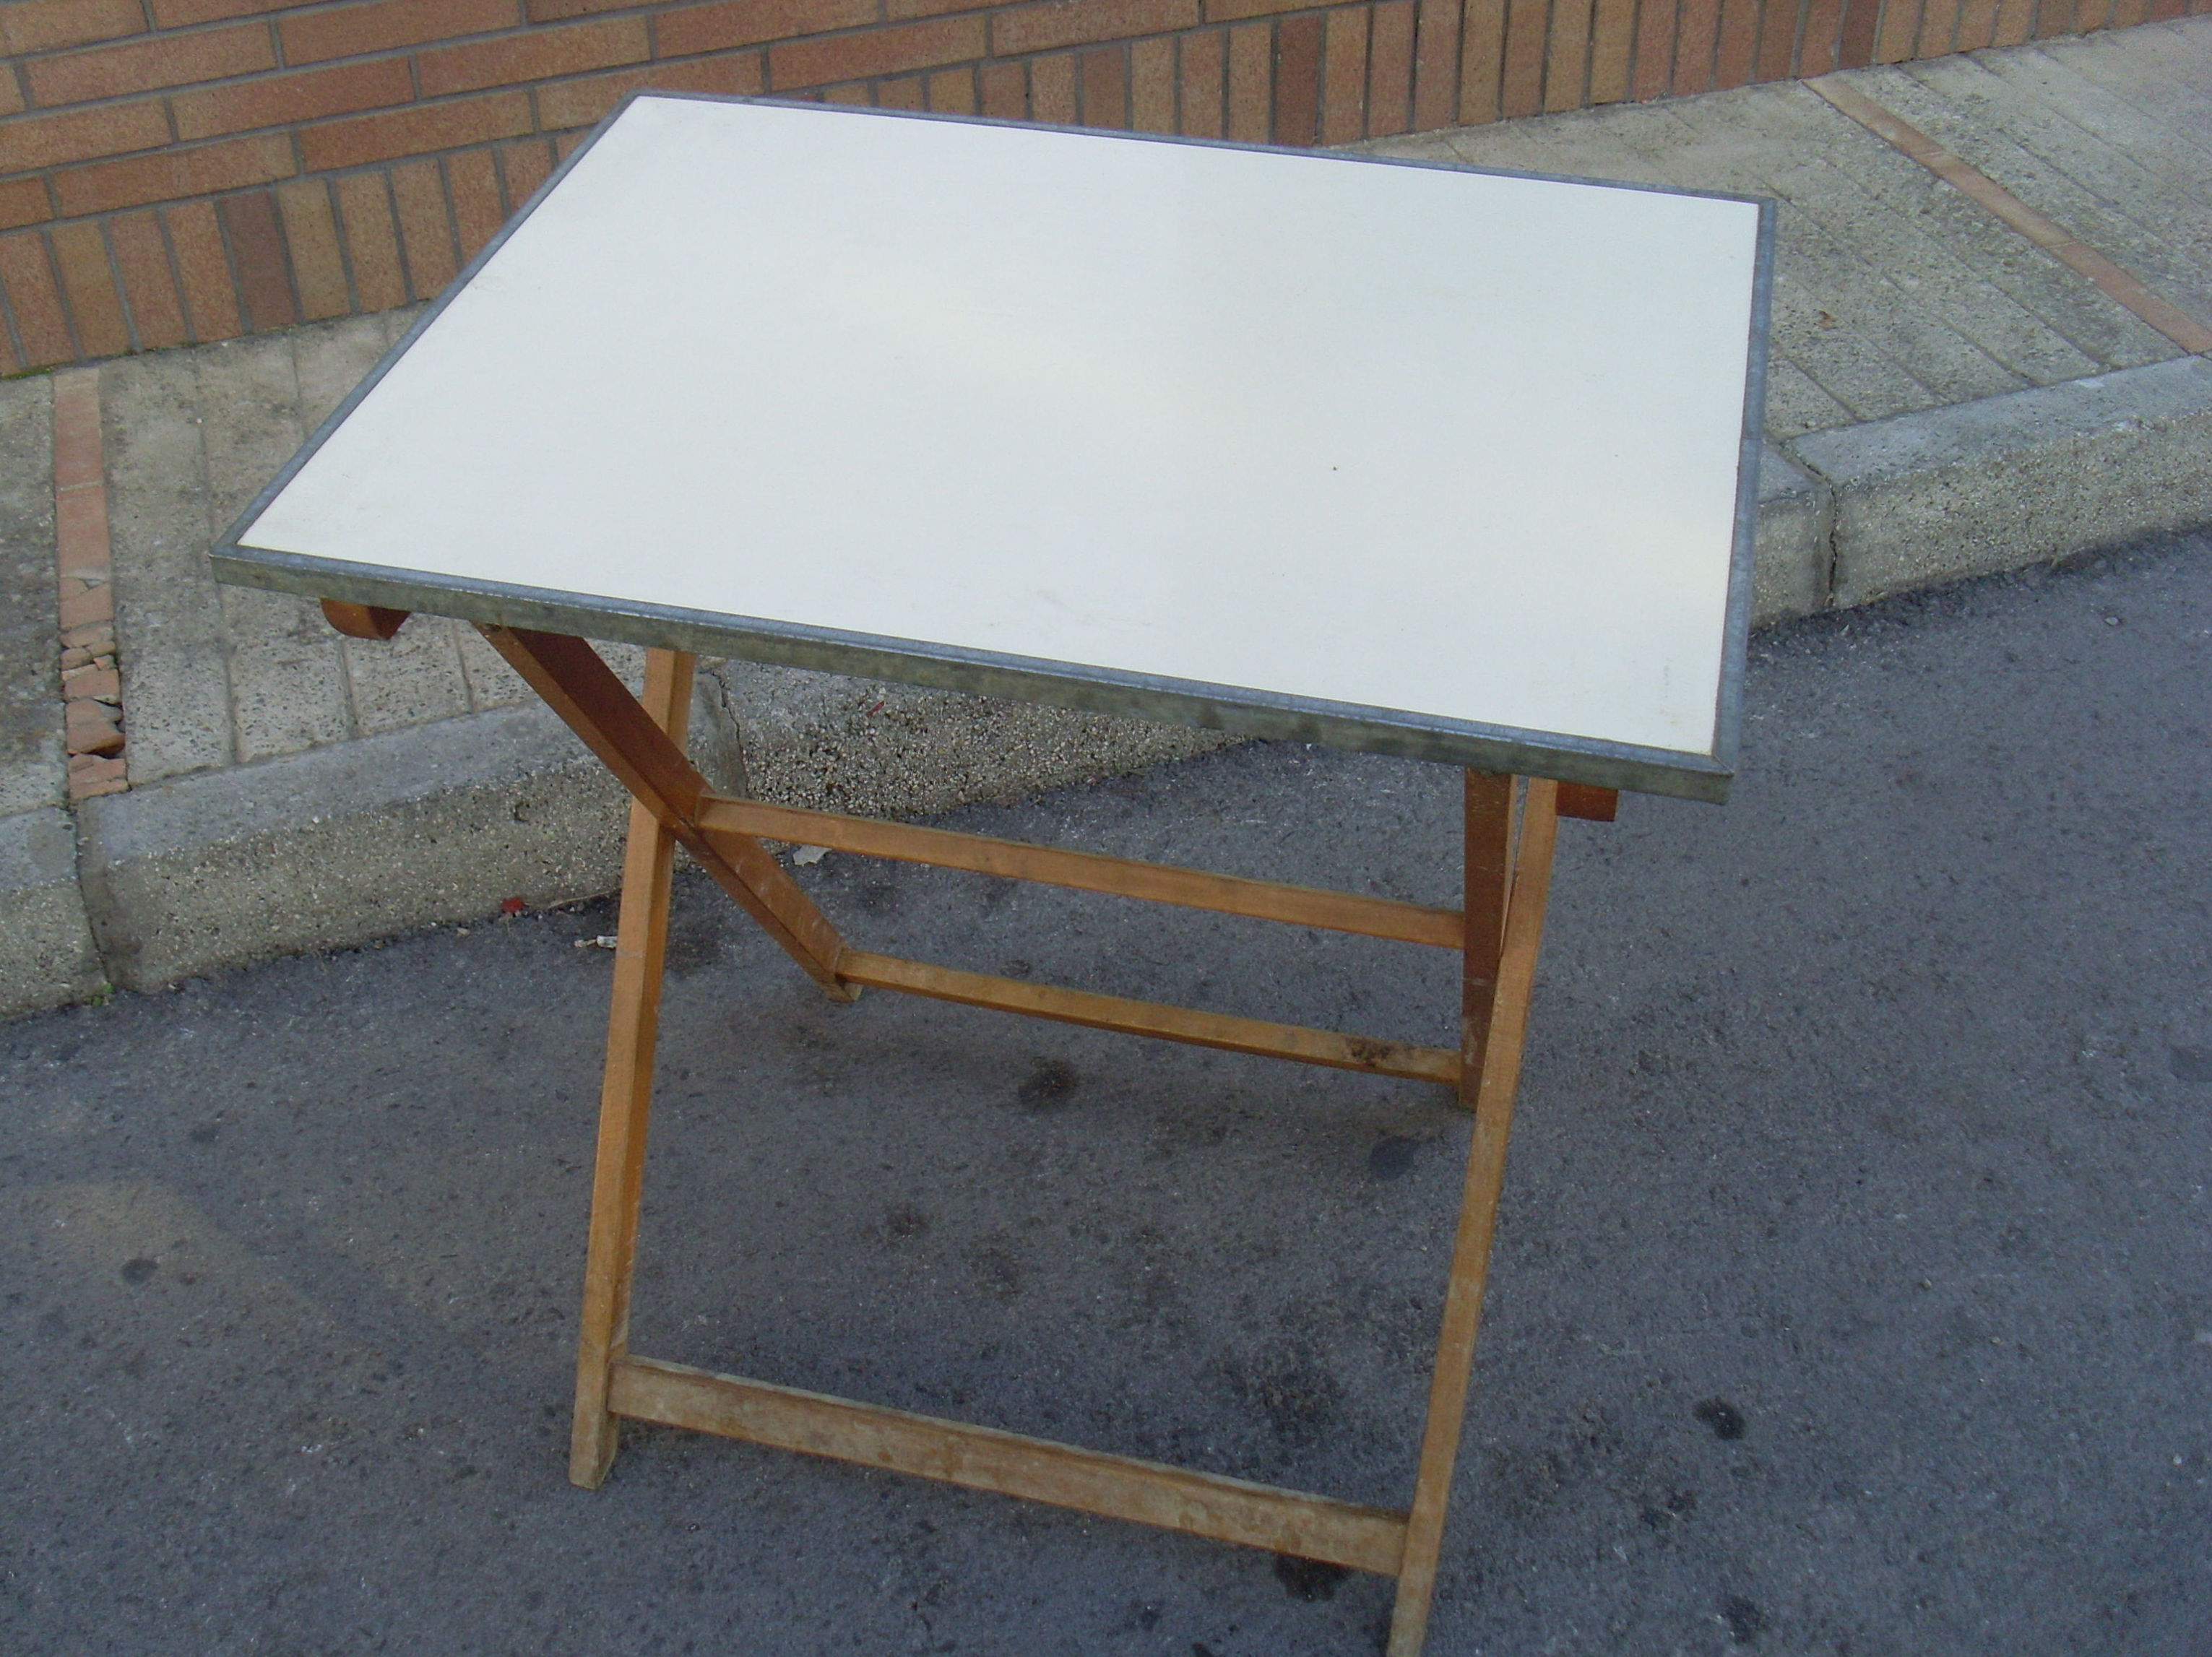 Mesa velador plegable madera tapa formica blanca - Velador plegable ...